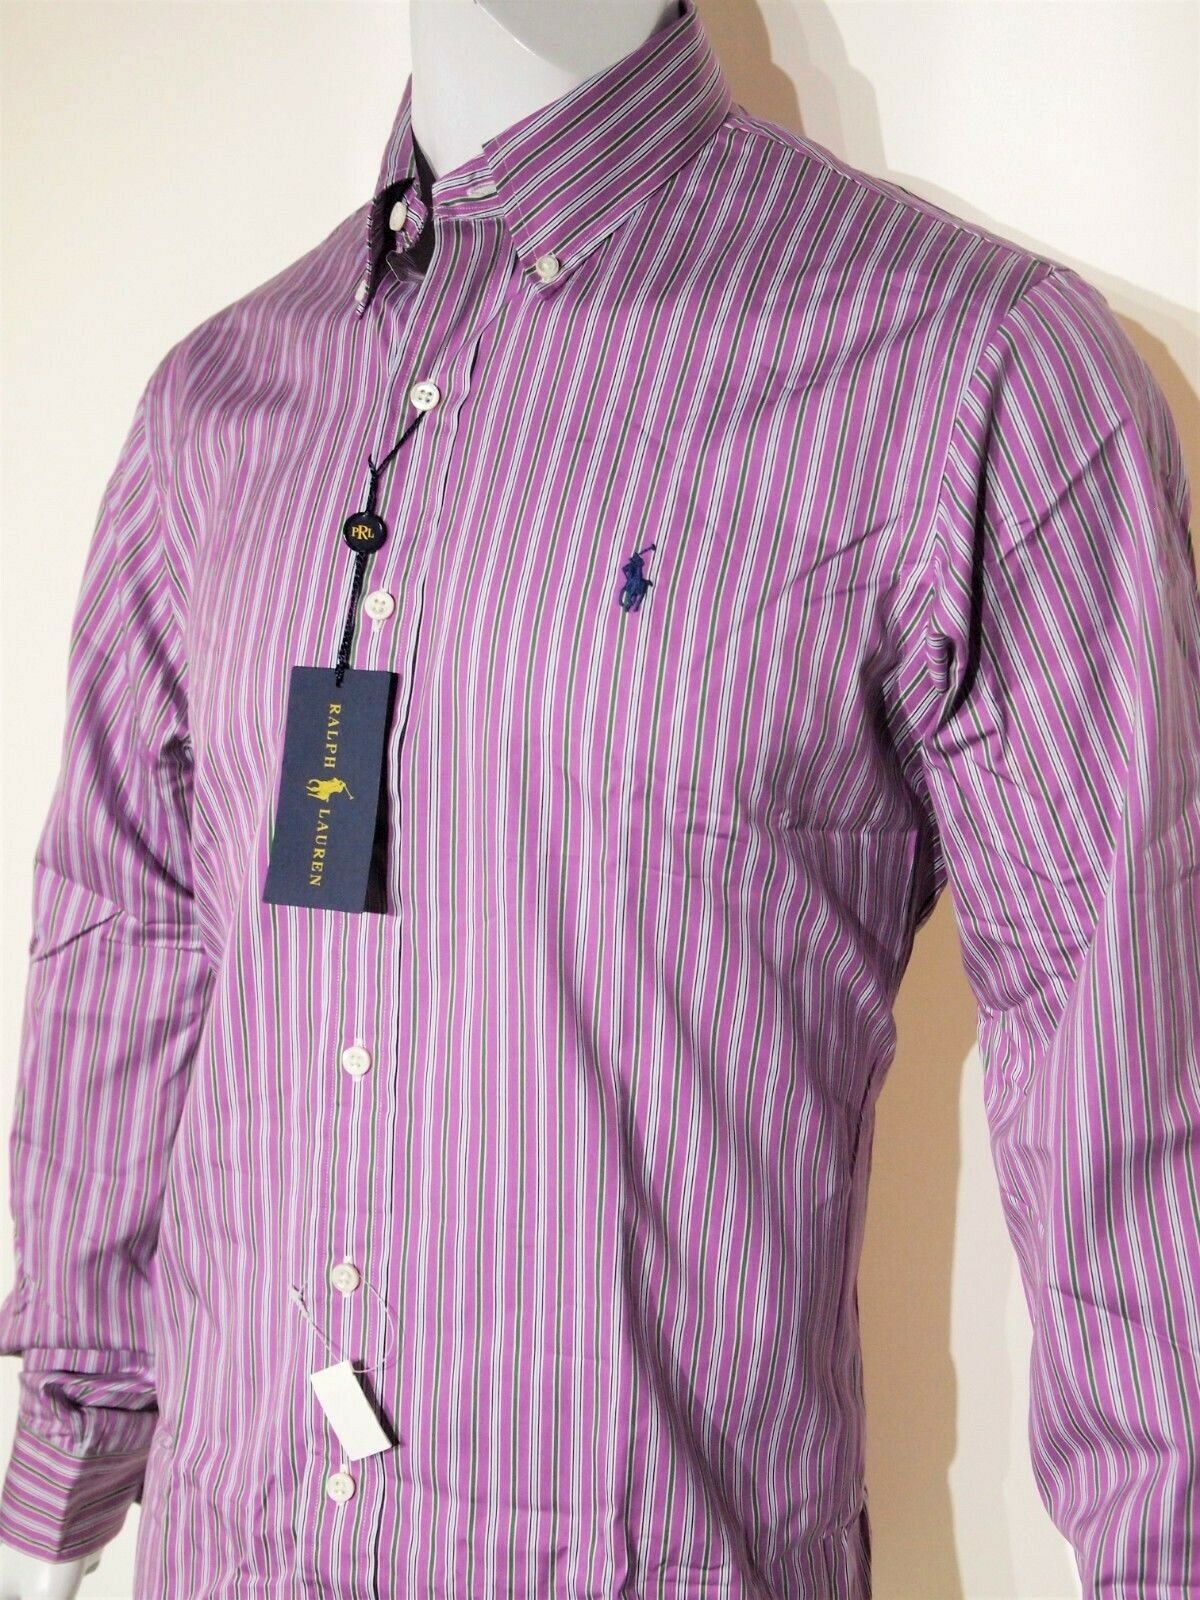 125aa6b94 Polo Lauren size multi striped shirt regular fit Ralph small  nnqpiv5646-Casual Button-Down Shirts